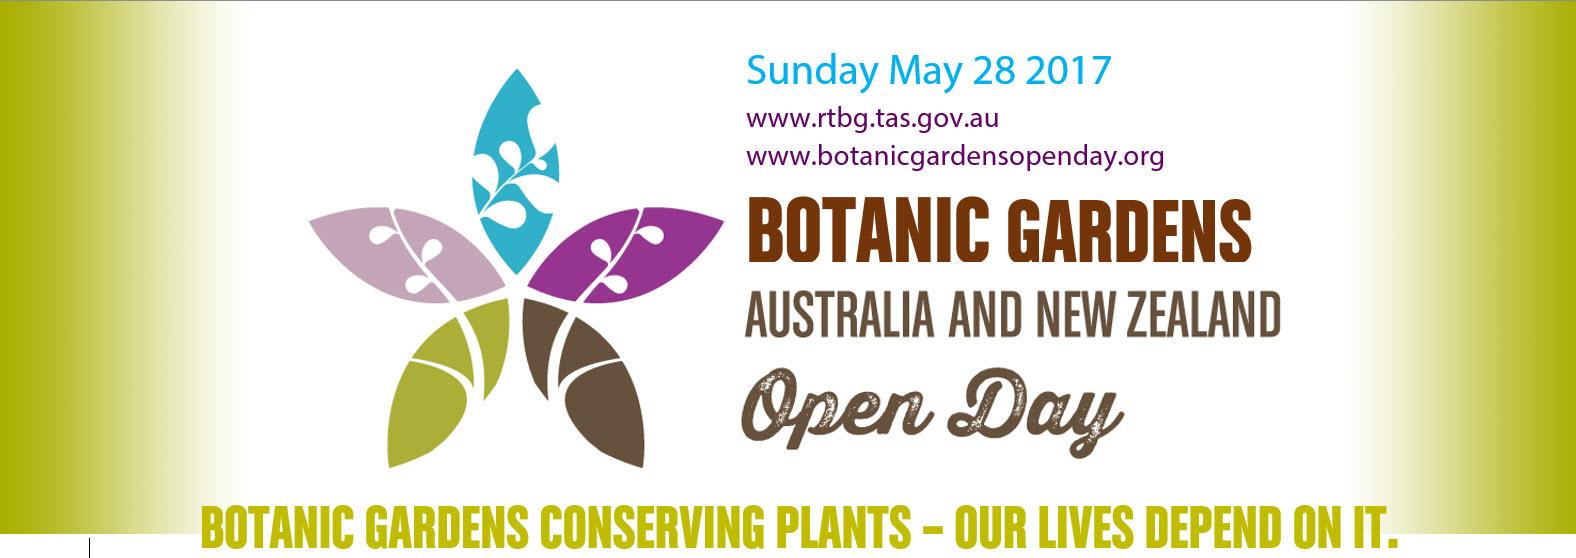 BGANZ-Open-day-RTBG-website-banner